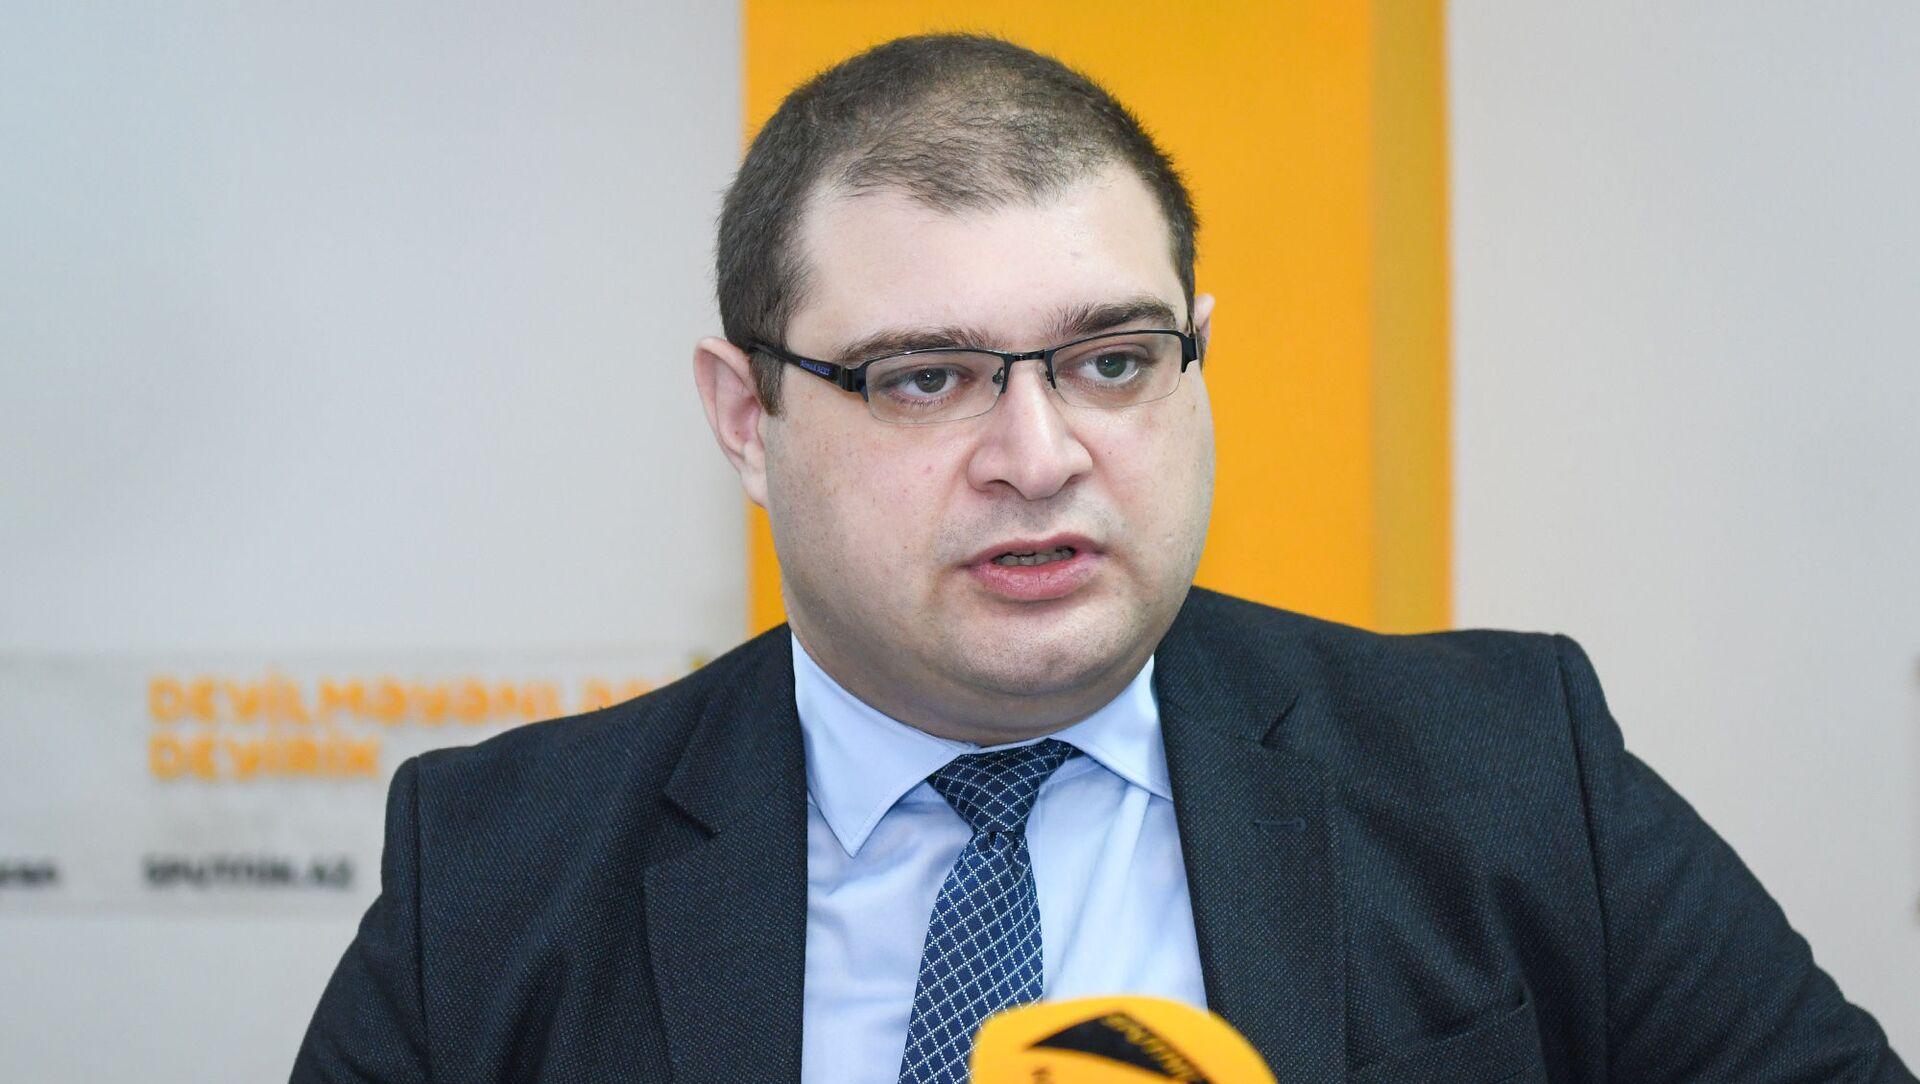 Директор Кавказского центра политического анализа Ахмед Алили - Sputnik Азербайджан, 1920, 22.09.2021